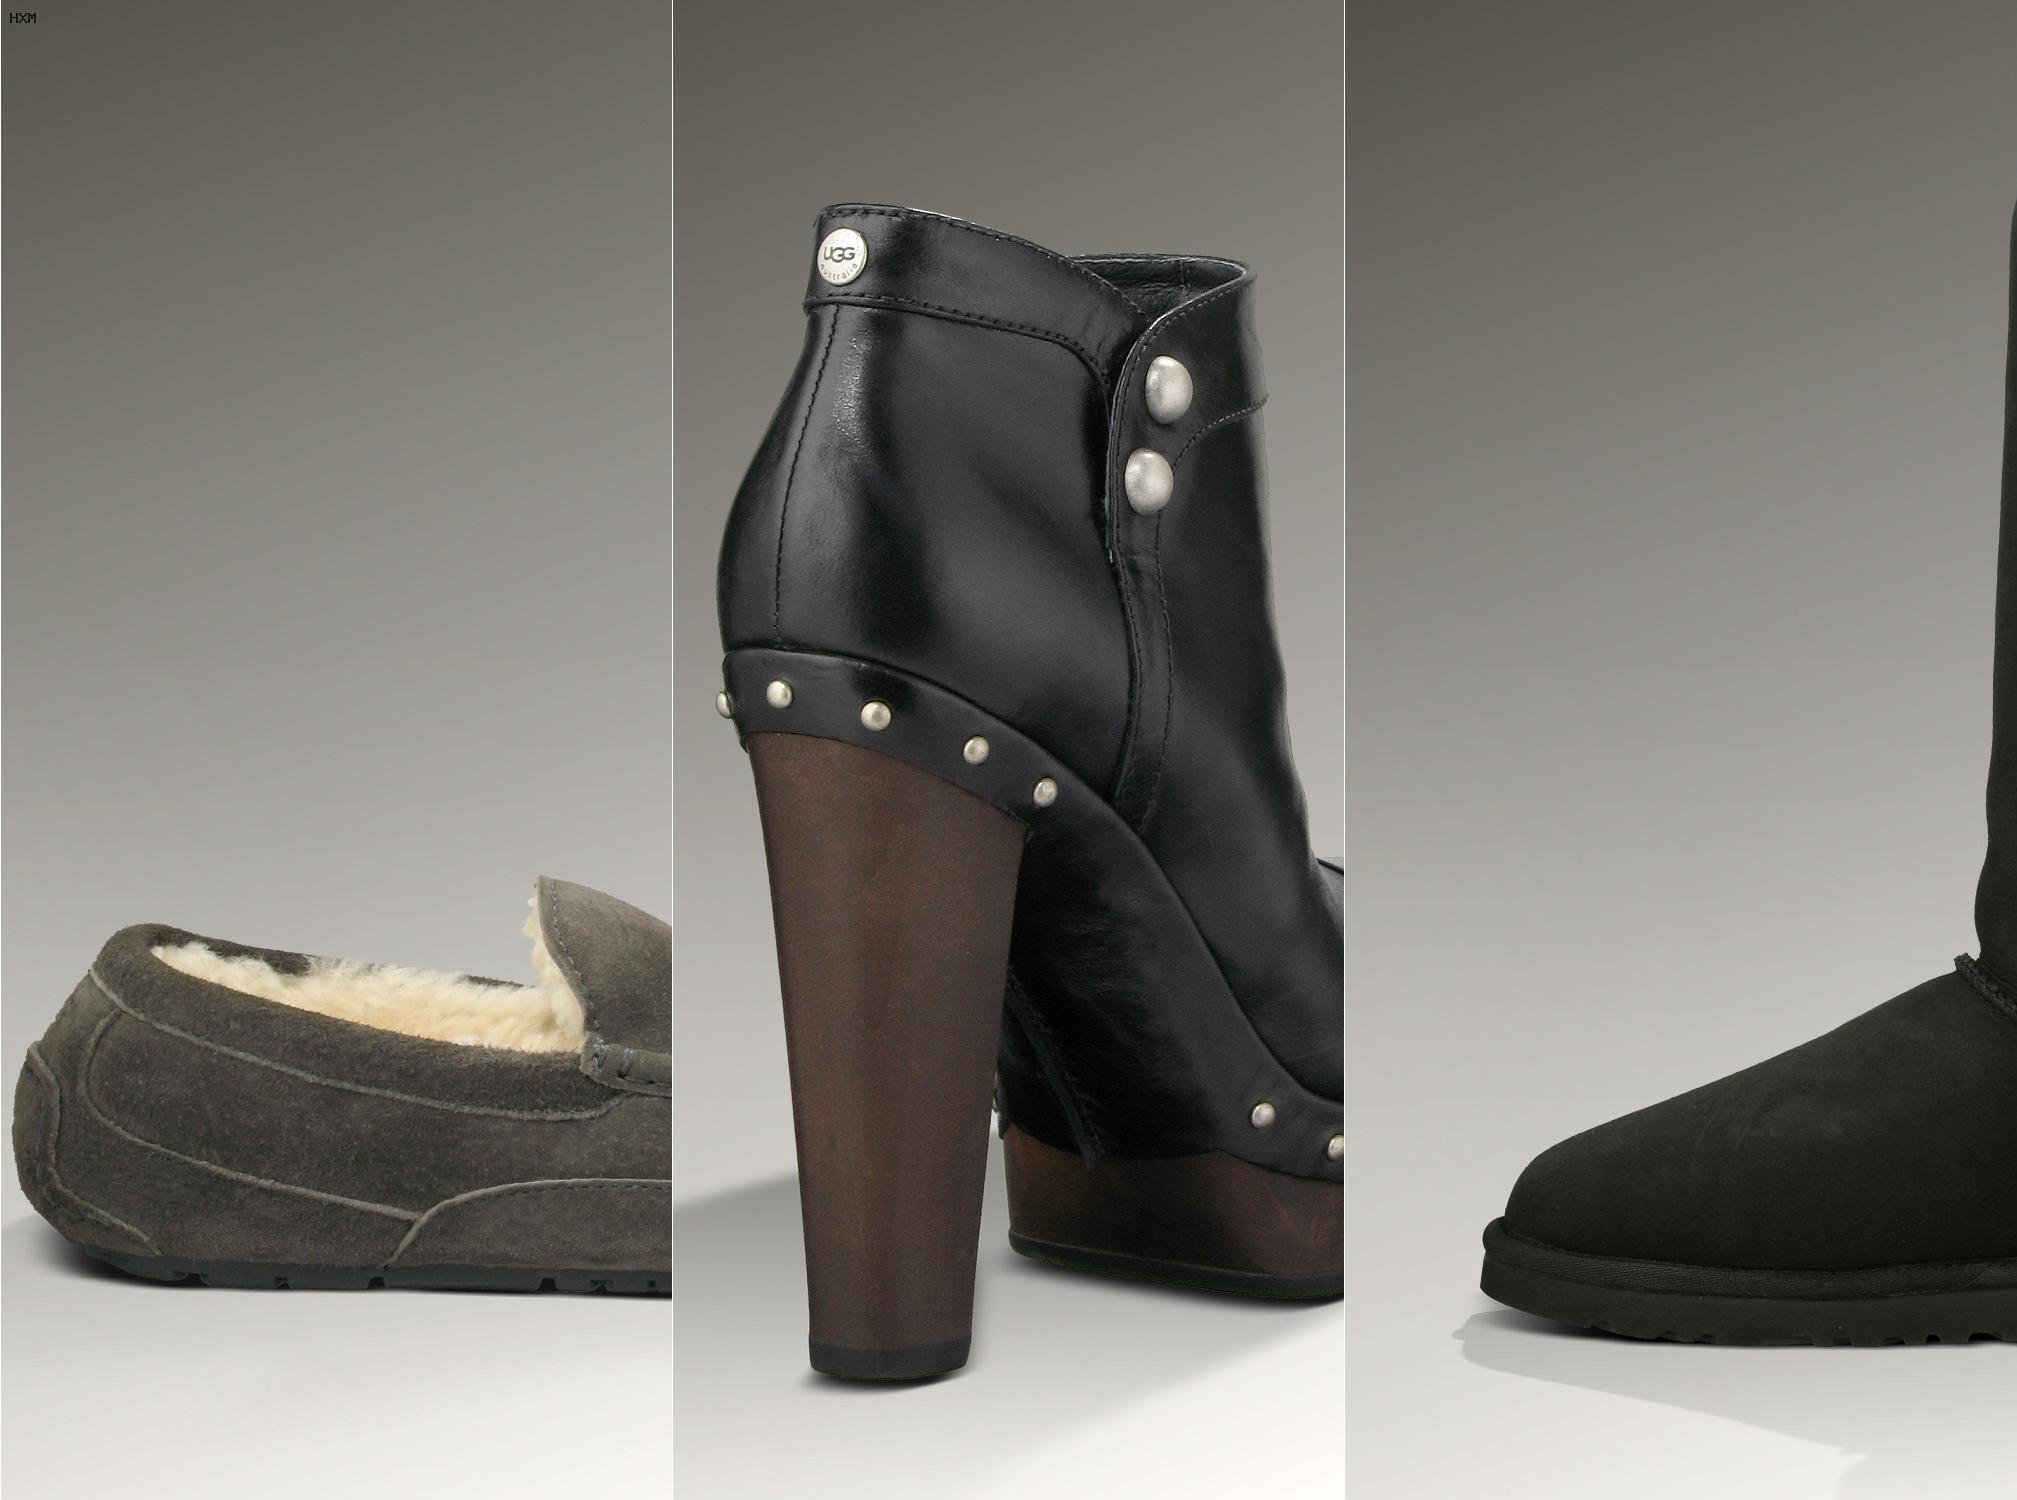 pantofole ugg saldi